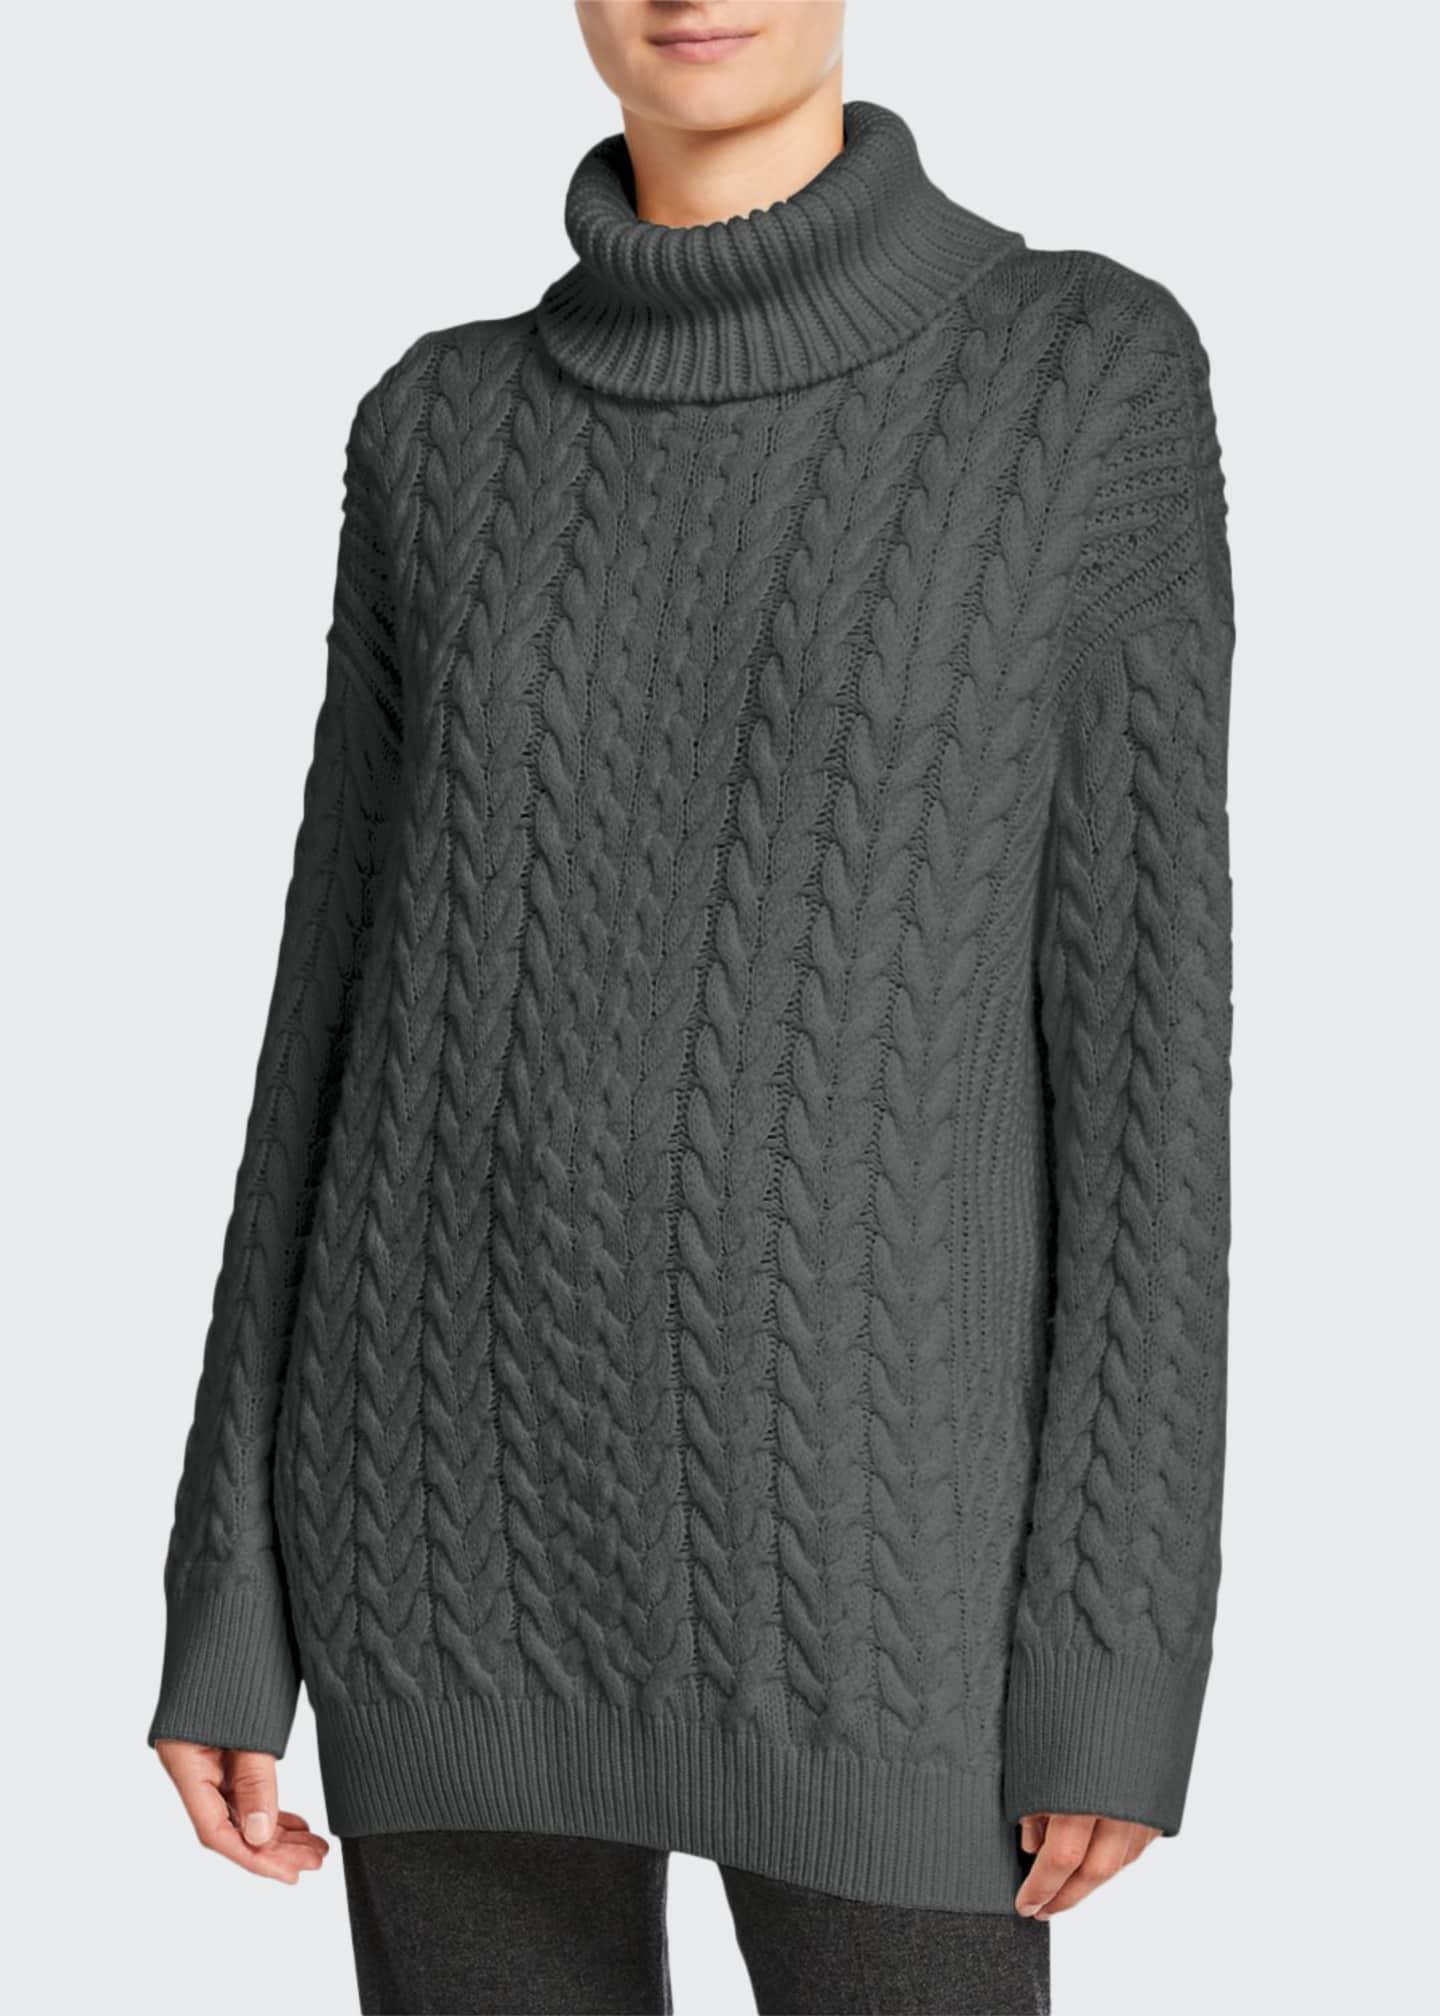 Loro Piana Oversized Cable-Knit Turtleneck Sweater